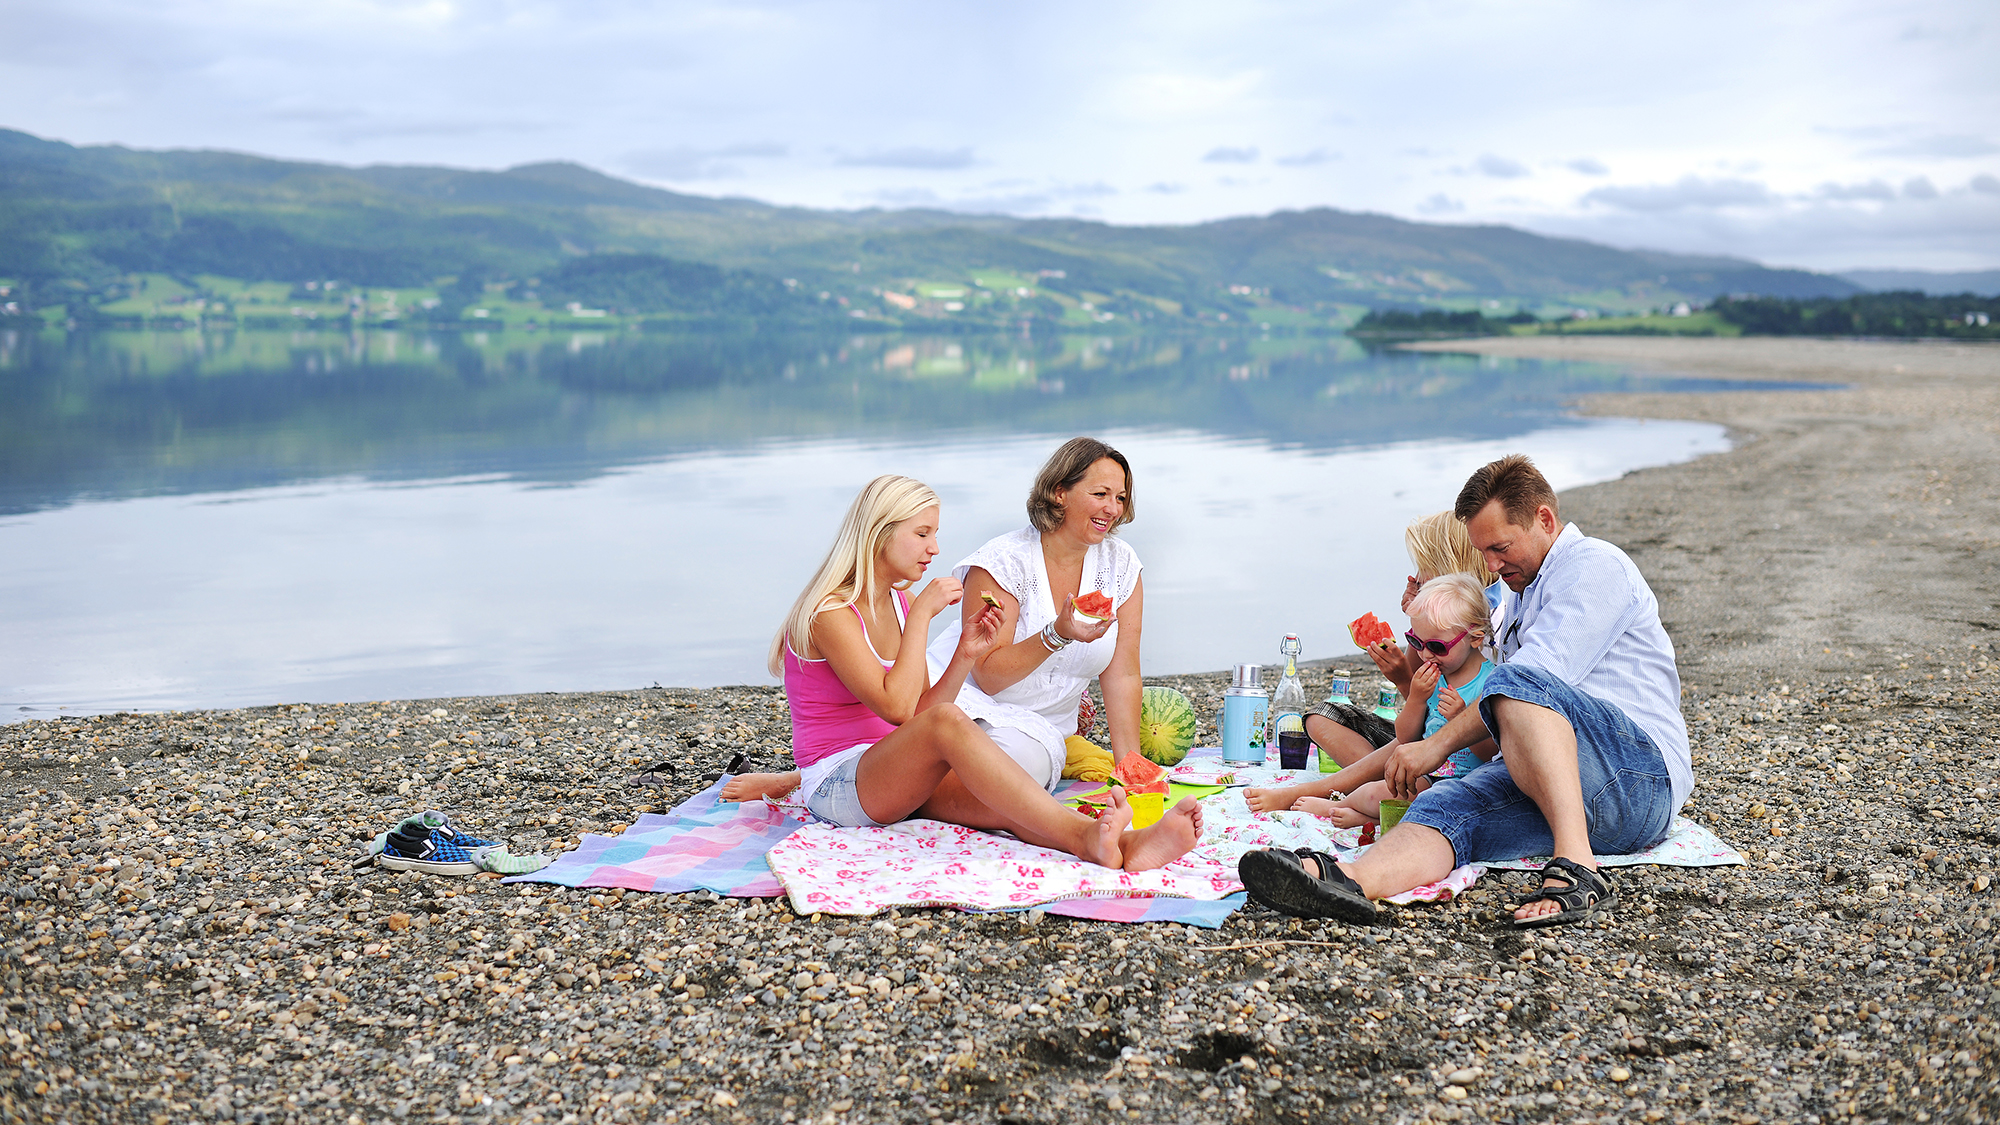 Piknik ved Selbusjøen. Foto: Marius Rua / trondelag.com